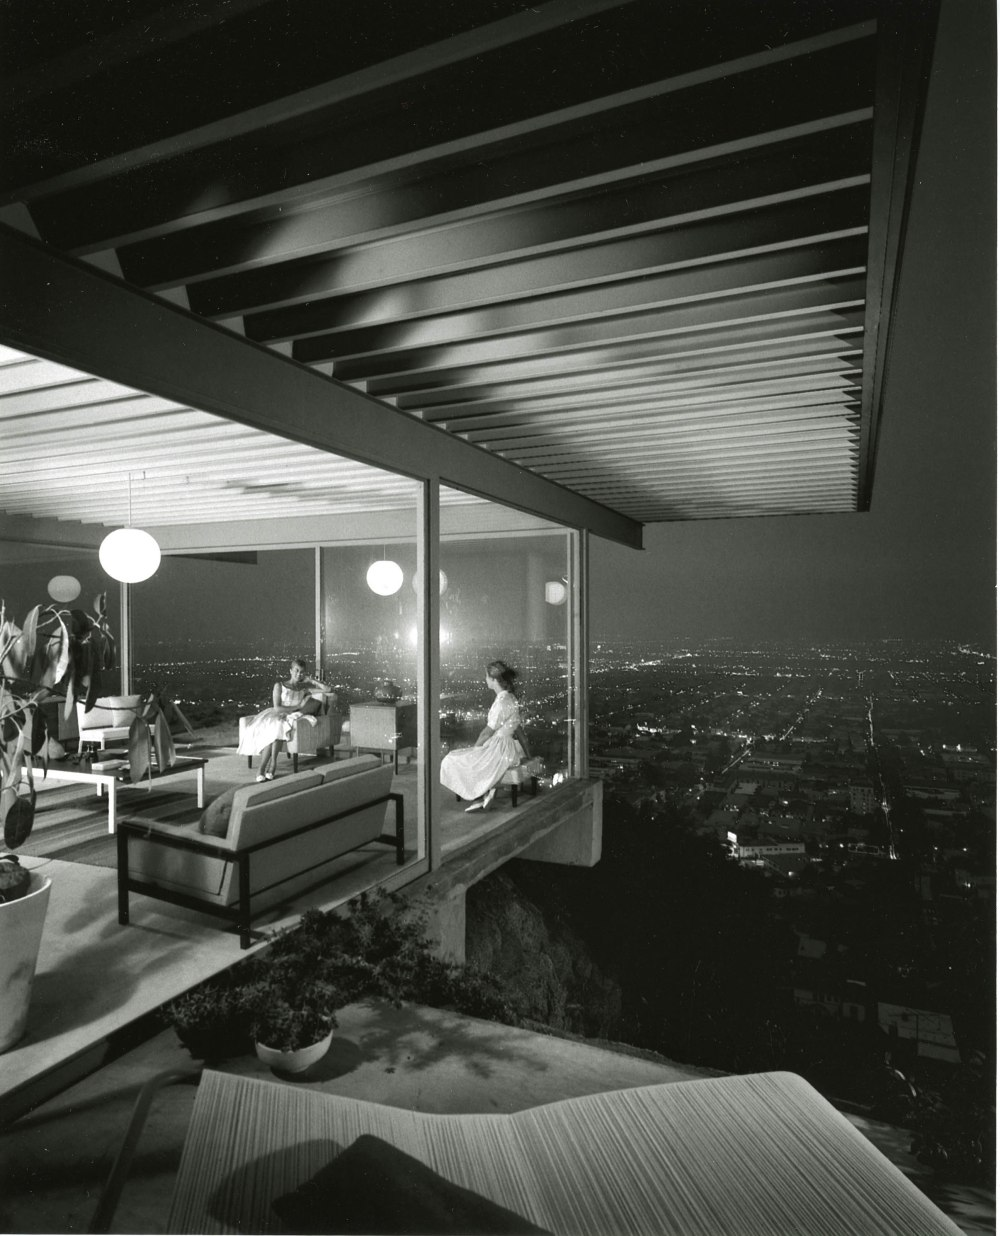 Stahl House - Case Study Houses / Pierre Koenig - 1960